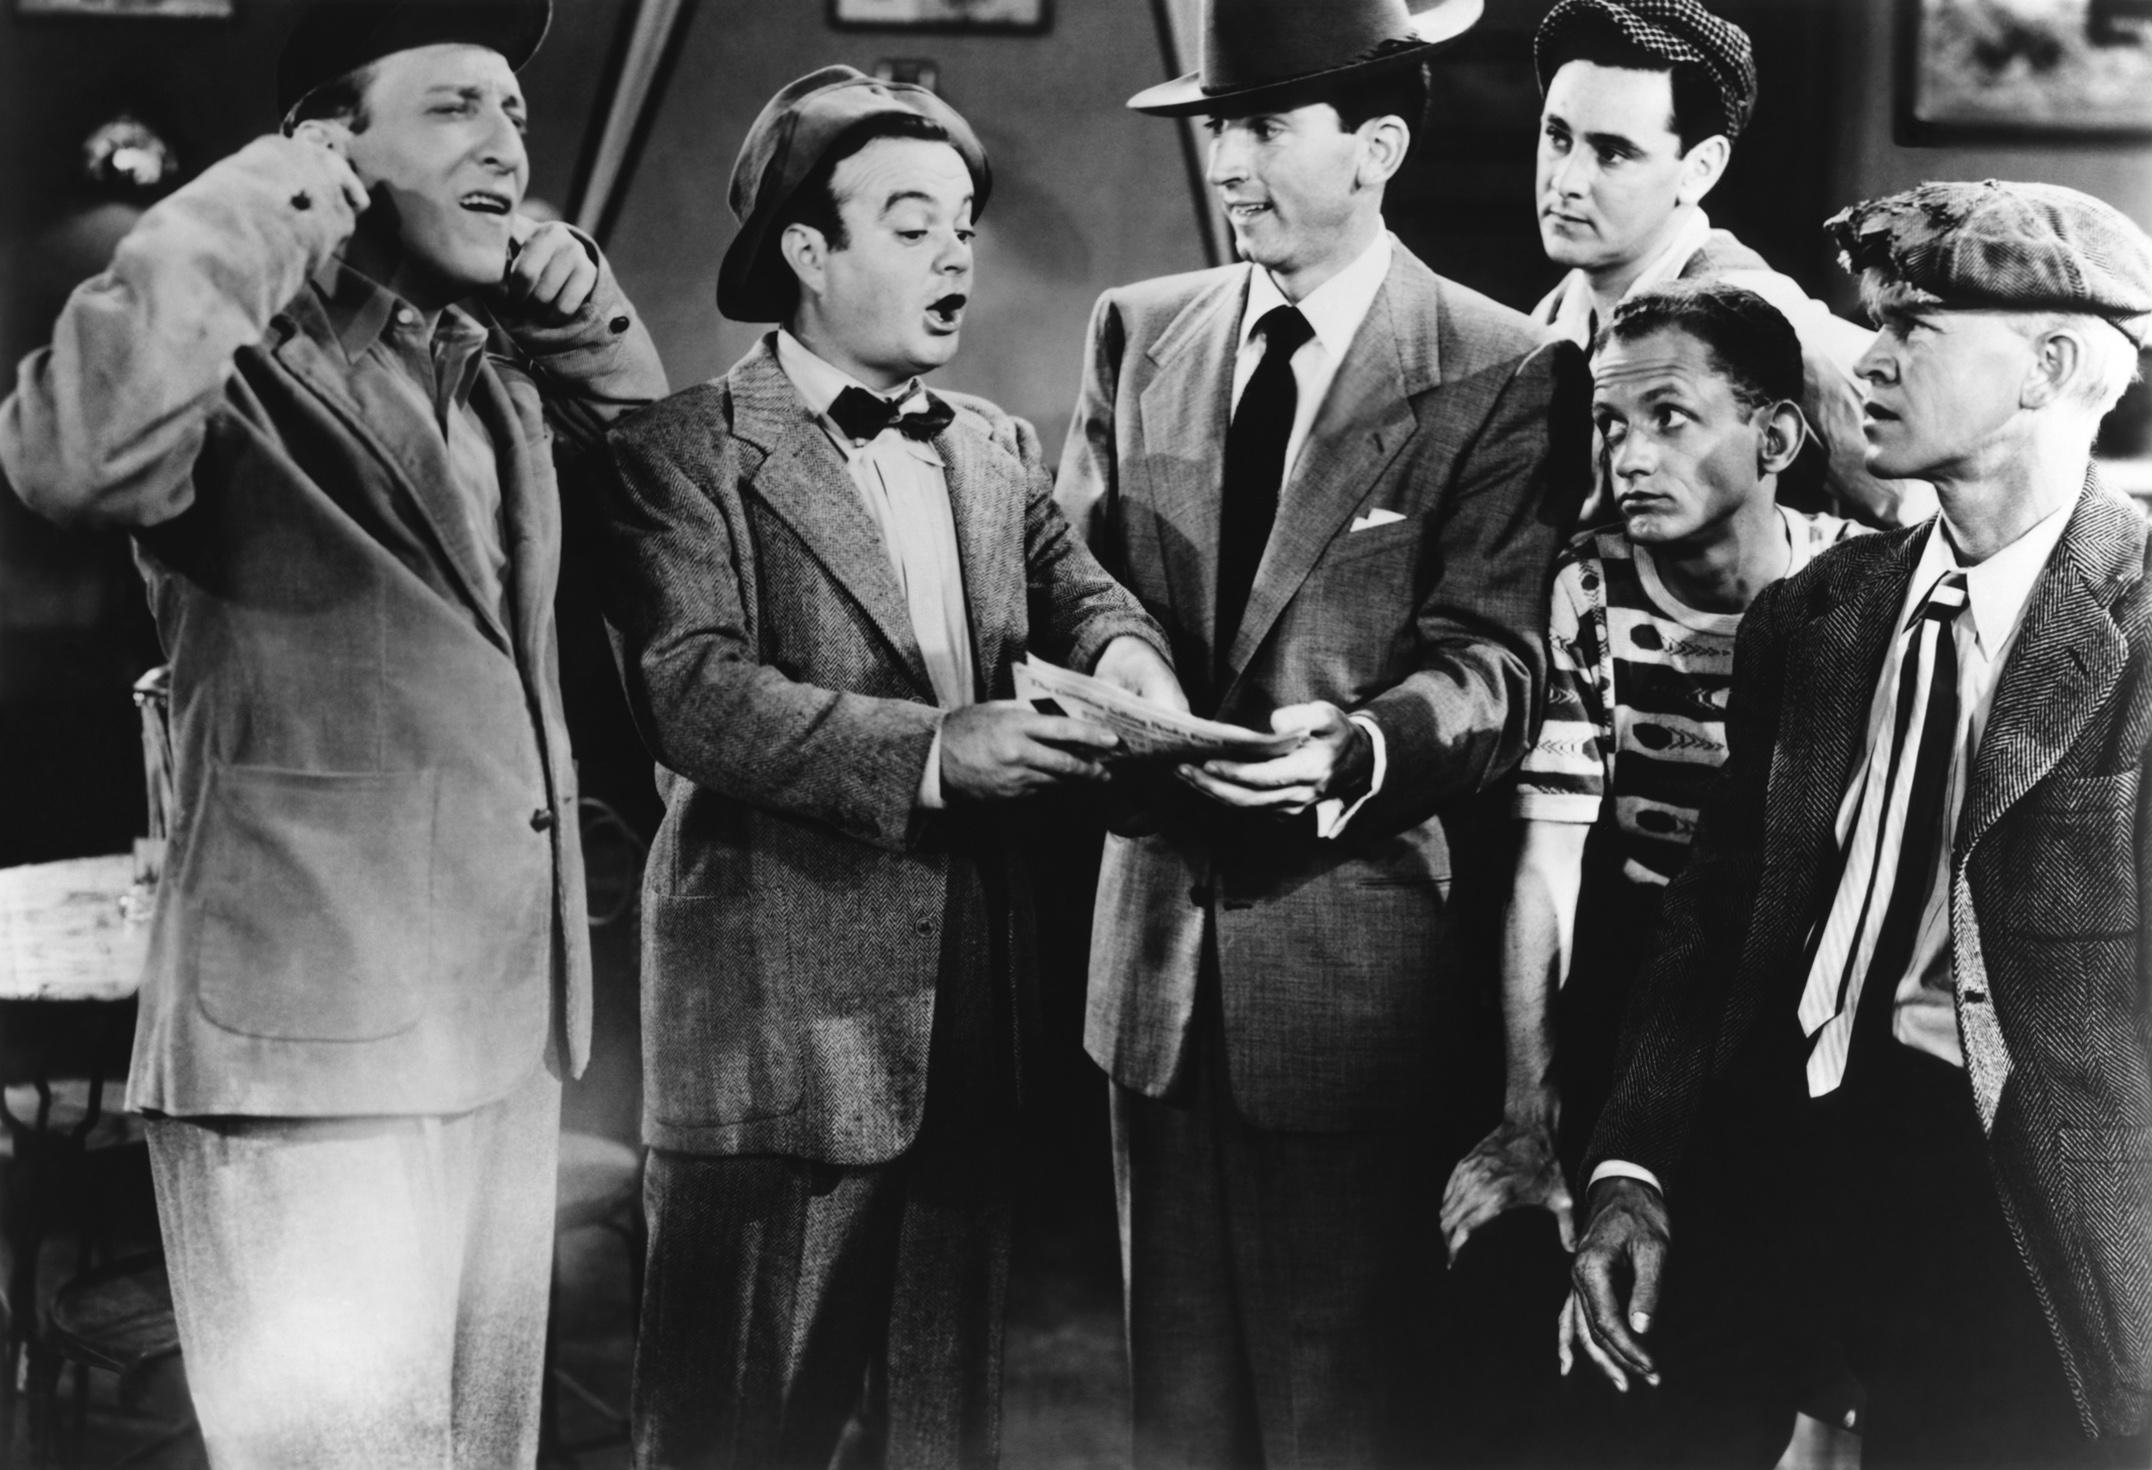 Leo Gorcey....(L to R) Huntz Hall, Leo Gorcey, Gabriel Dell, David Gorcey, Unknown, Billy Benedict